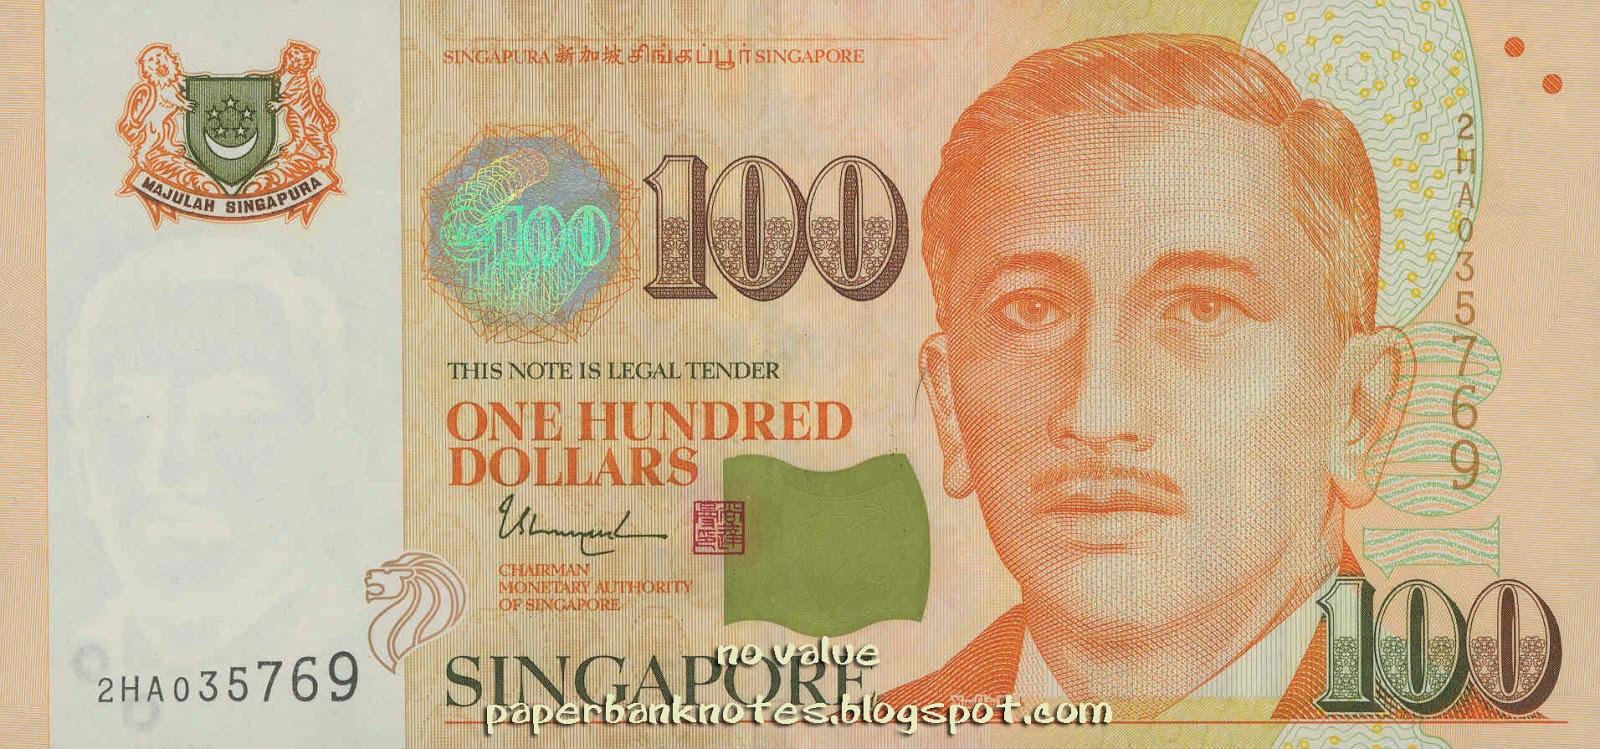 http://seabanknotes.blogspot.com/2011/09/singapore-tharma-shanmugaratran-2012.html